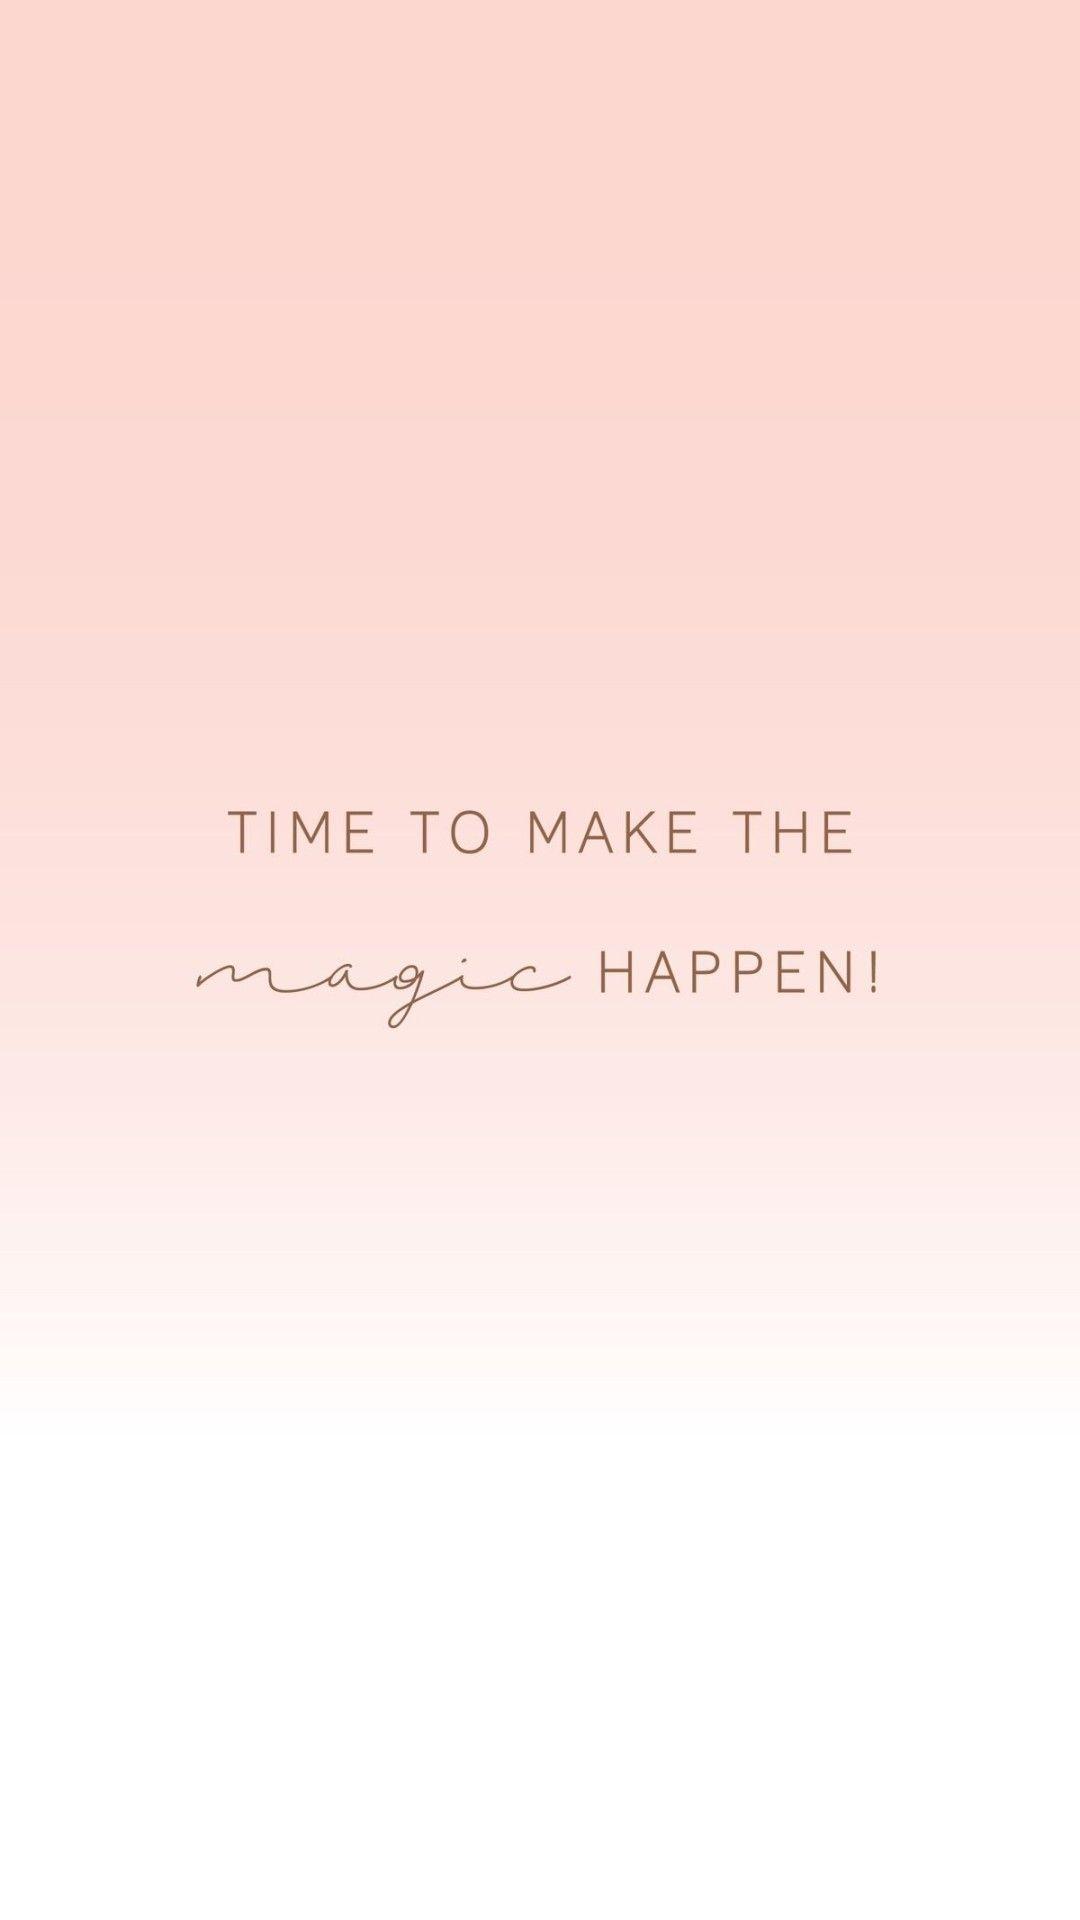 Stay Positive Motivasi Kata Kata Inspirasional